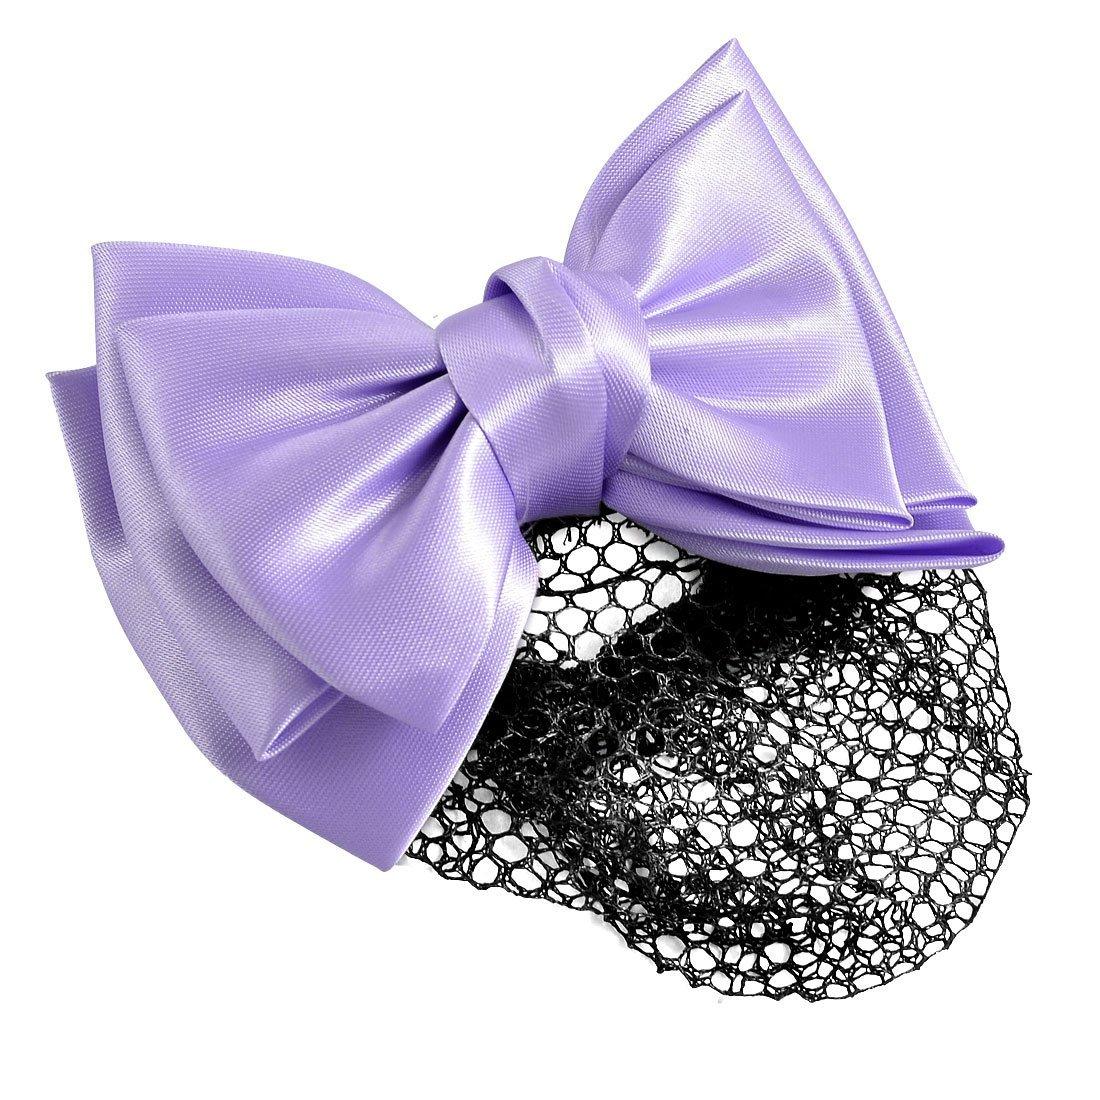 YeVhear Bowknot Net Snood Hair Black Clip New York Mall 0.05 pounds Purple Virginia Beach Mall